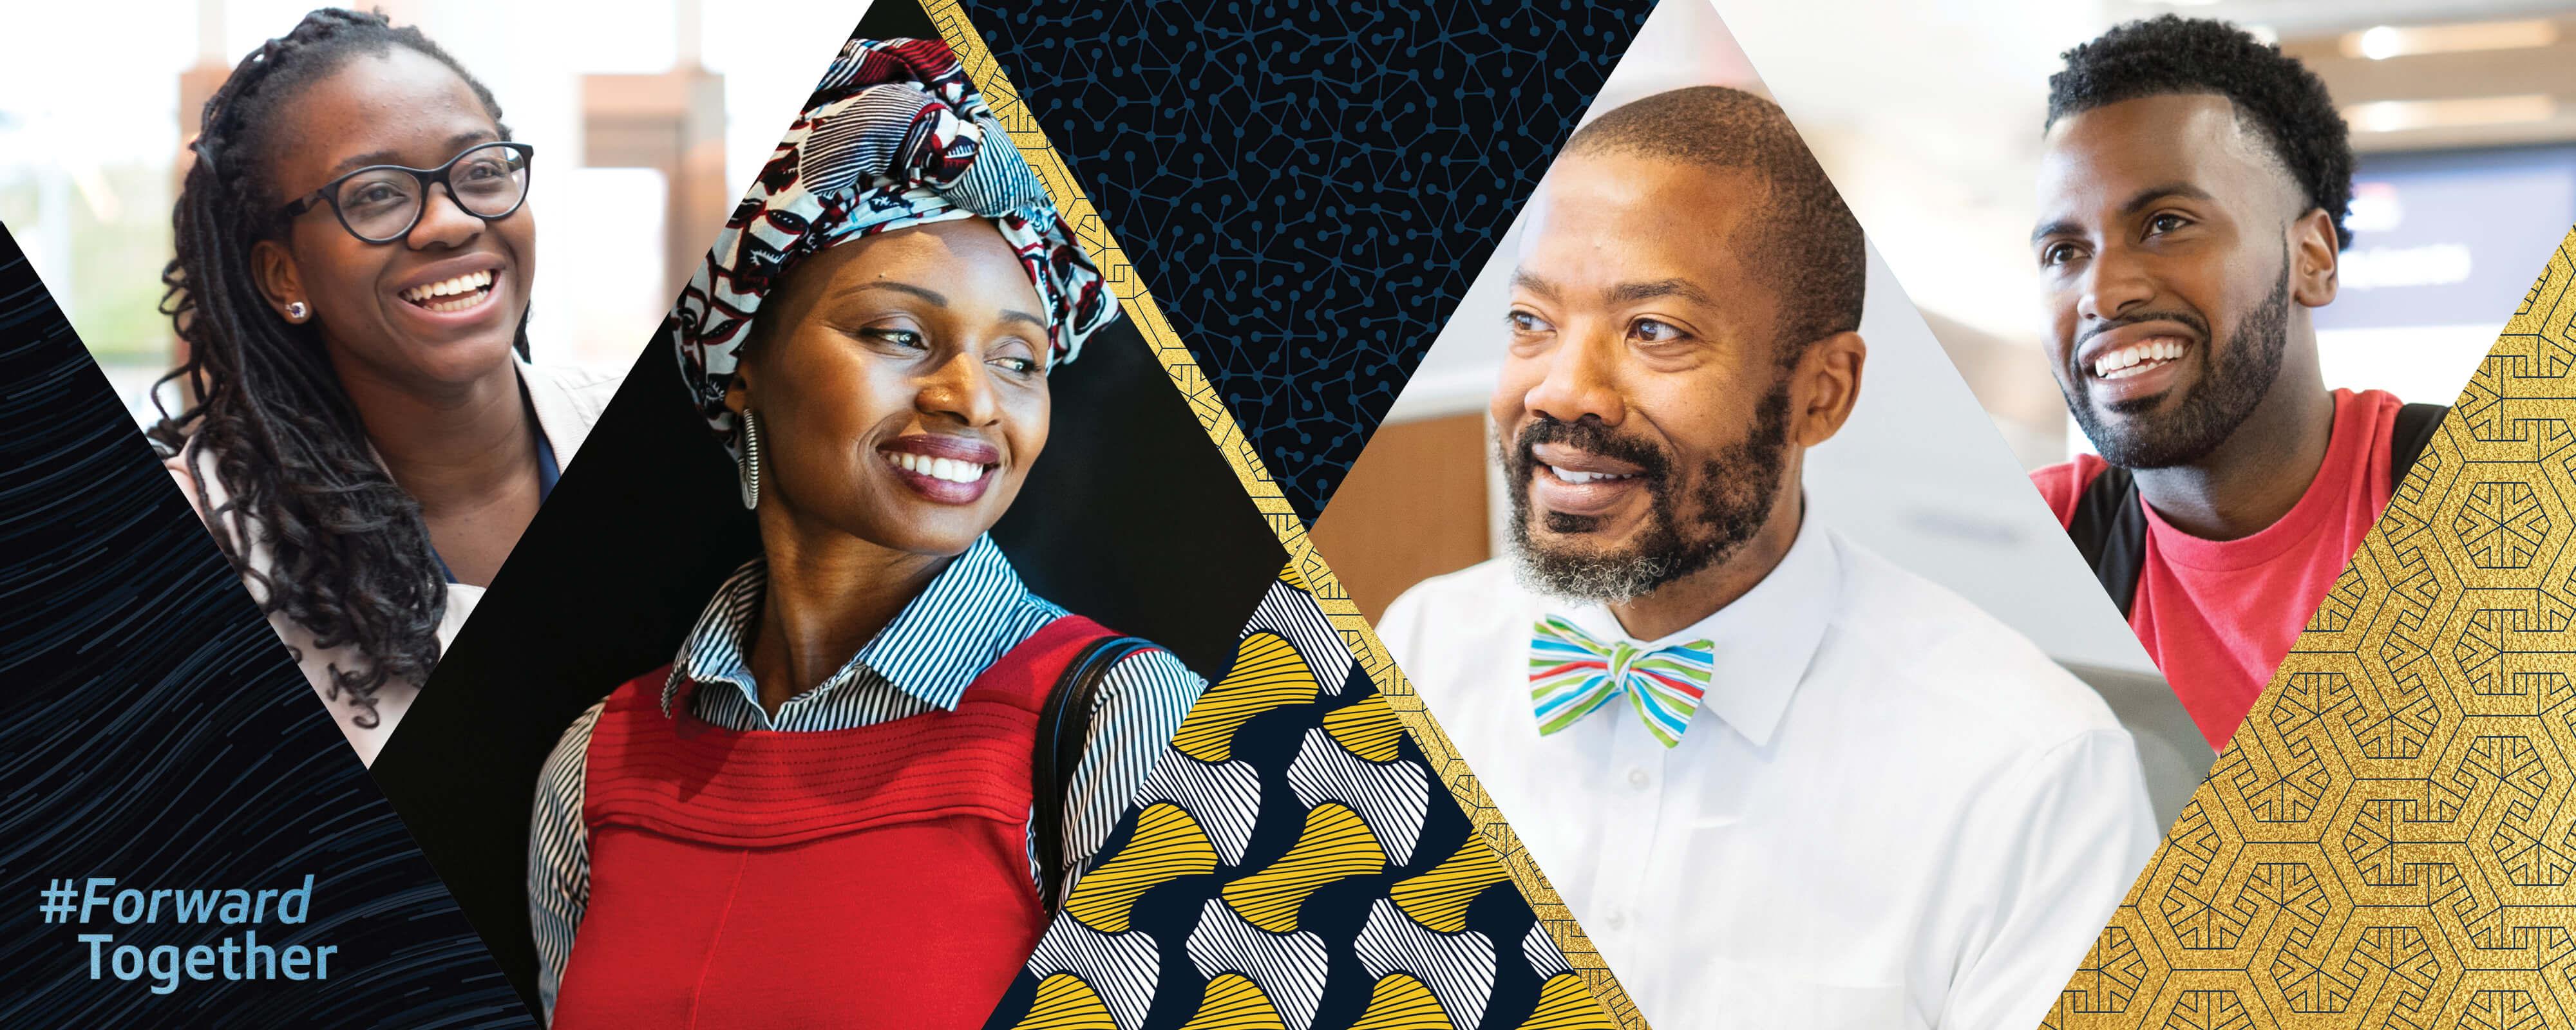 Capital One associates smiling celebrating Black History Month